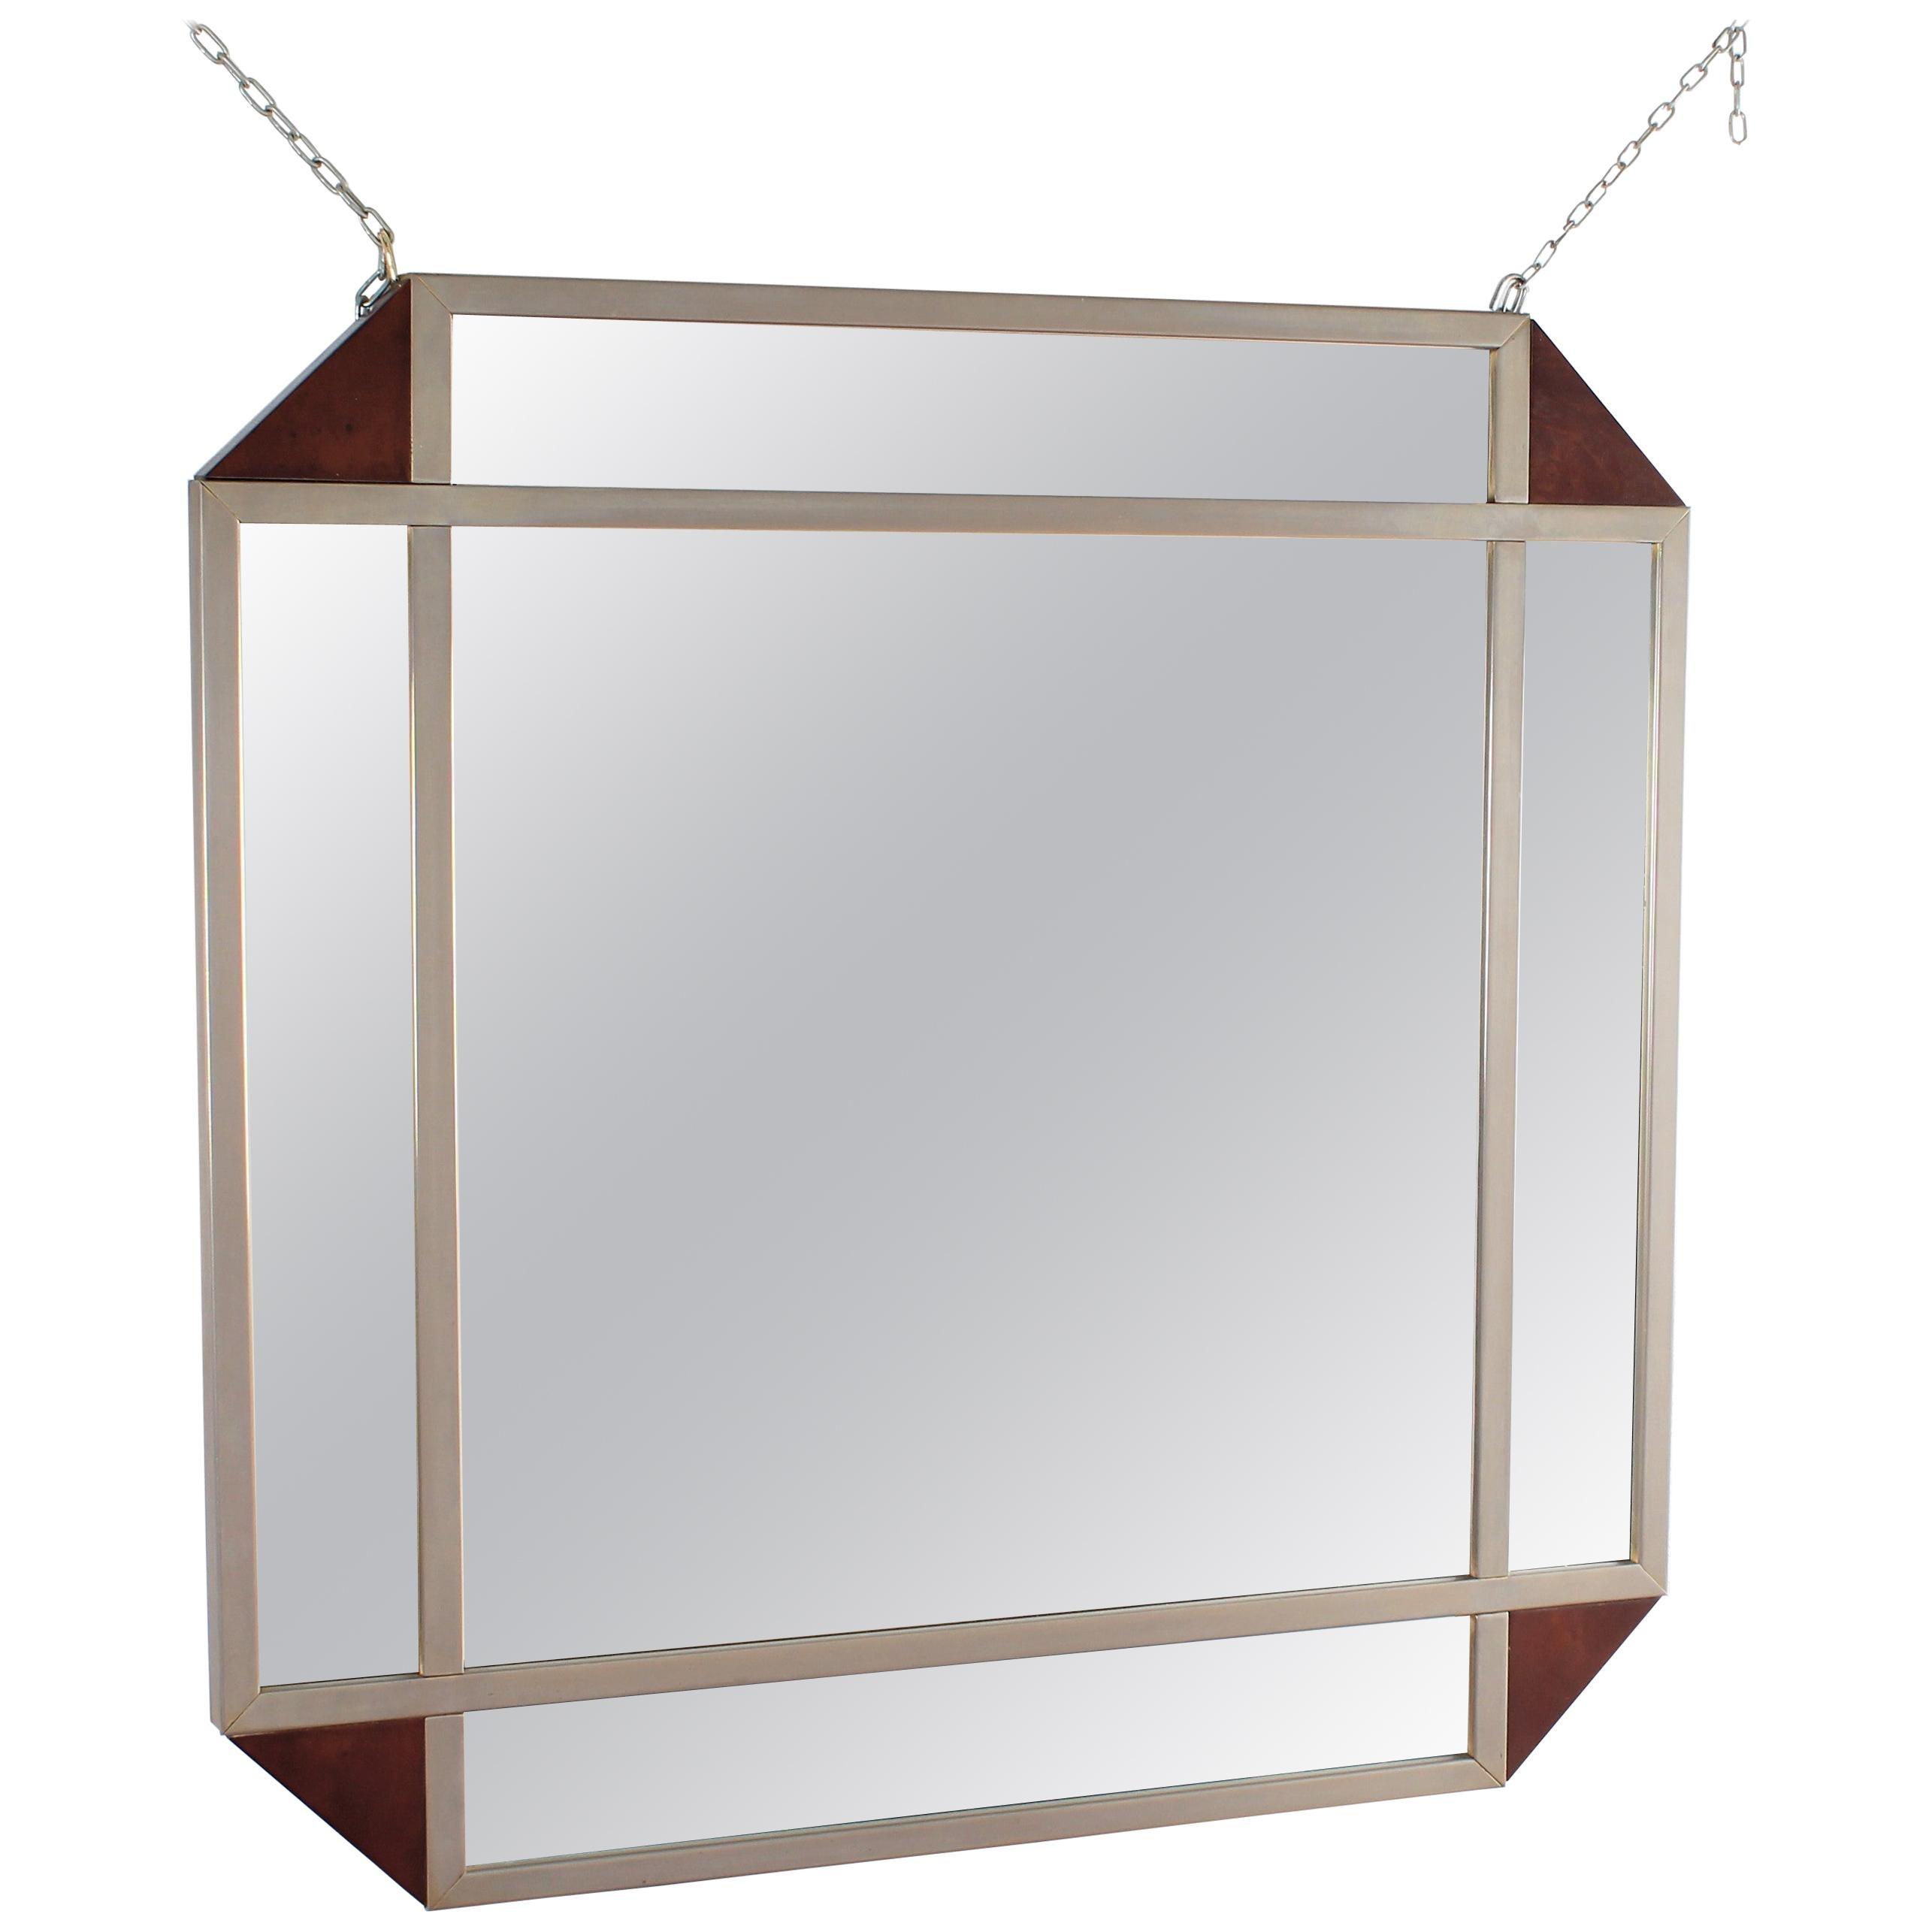 Midcentury Vintage R. Rega Metal and Wood Wall Mirrors, Italy, 1950s